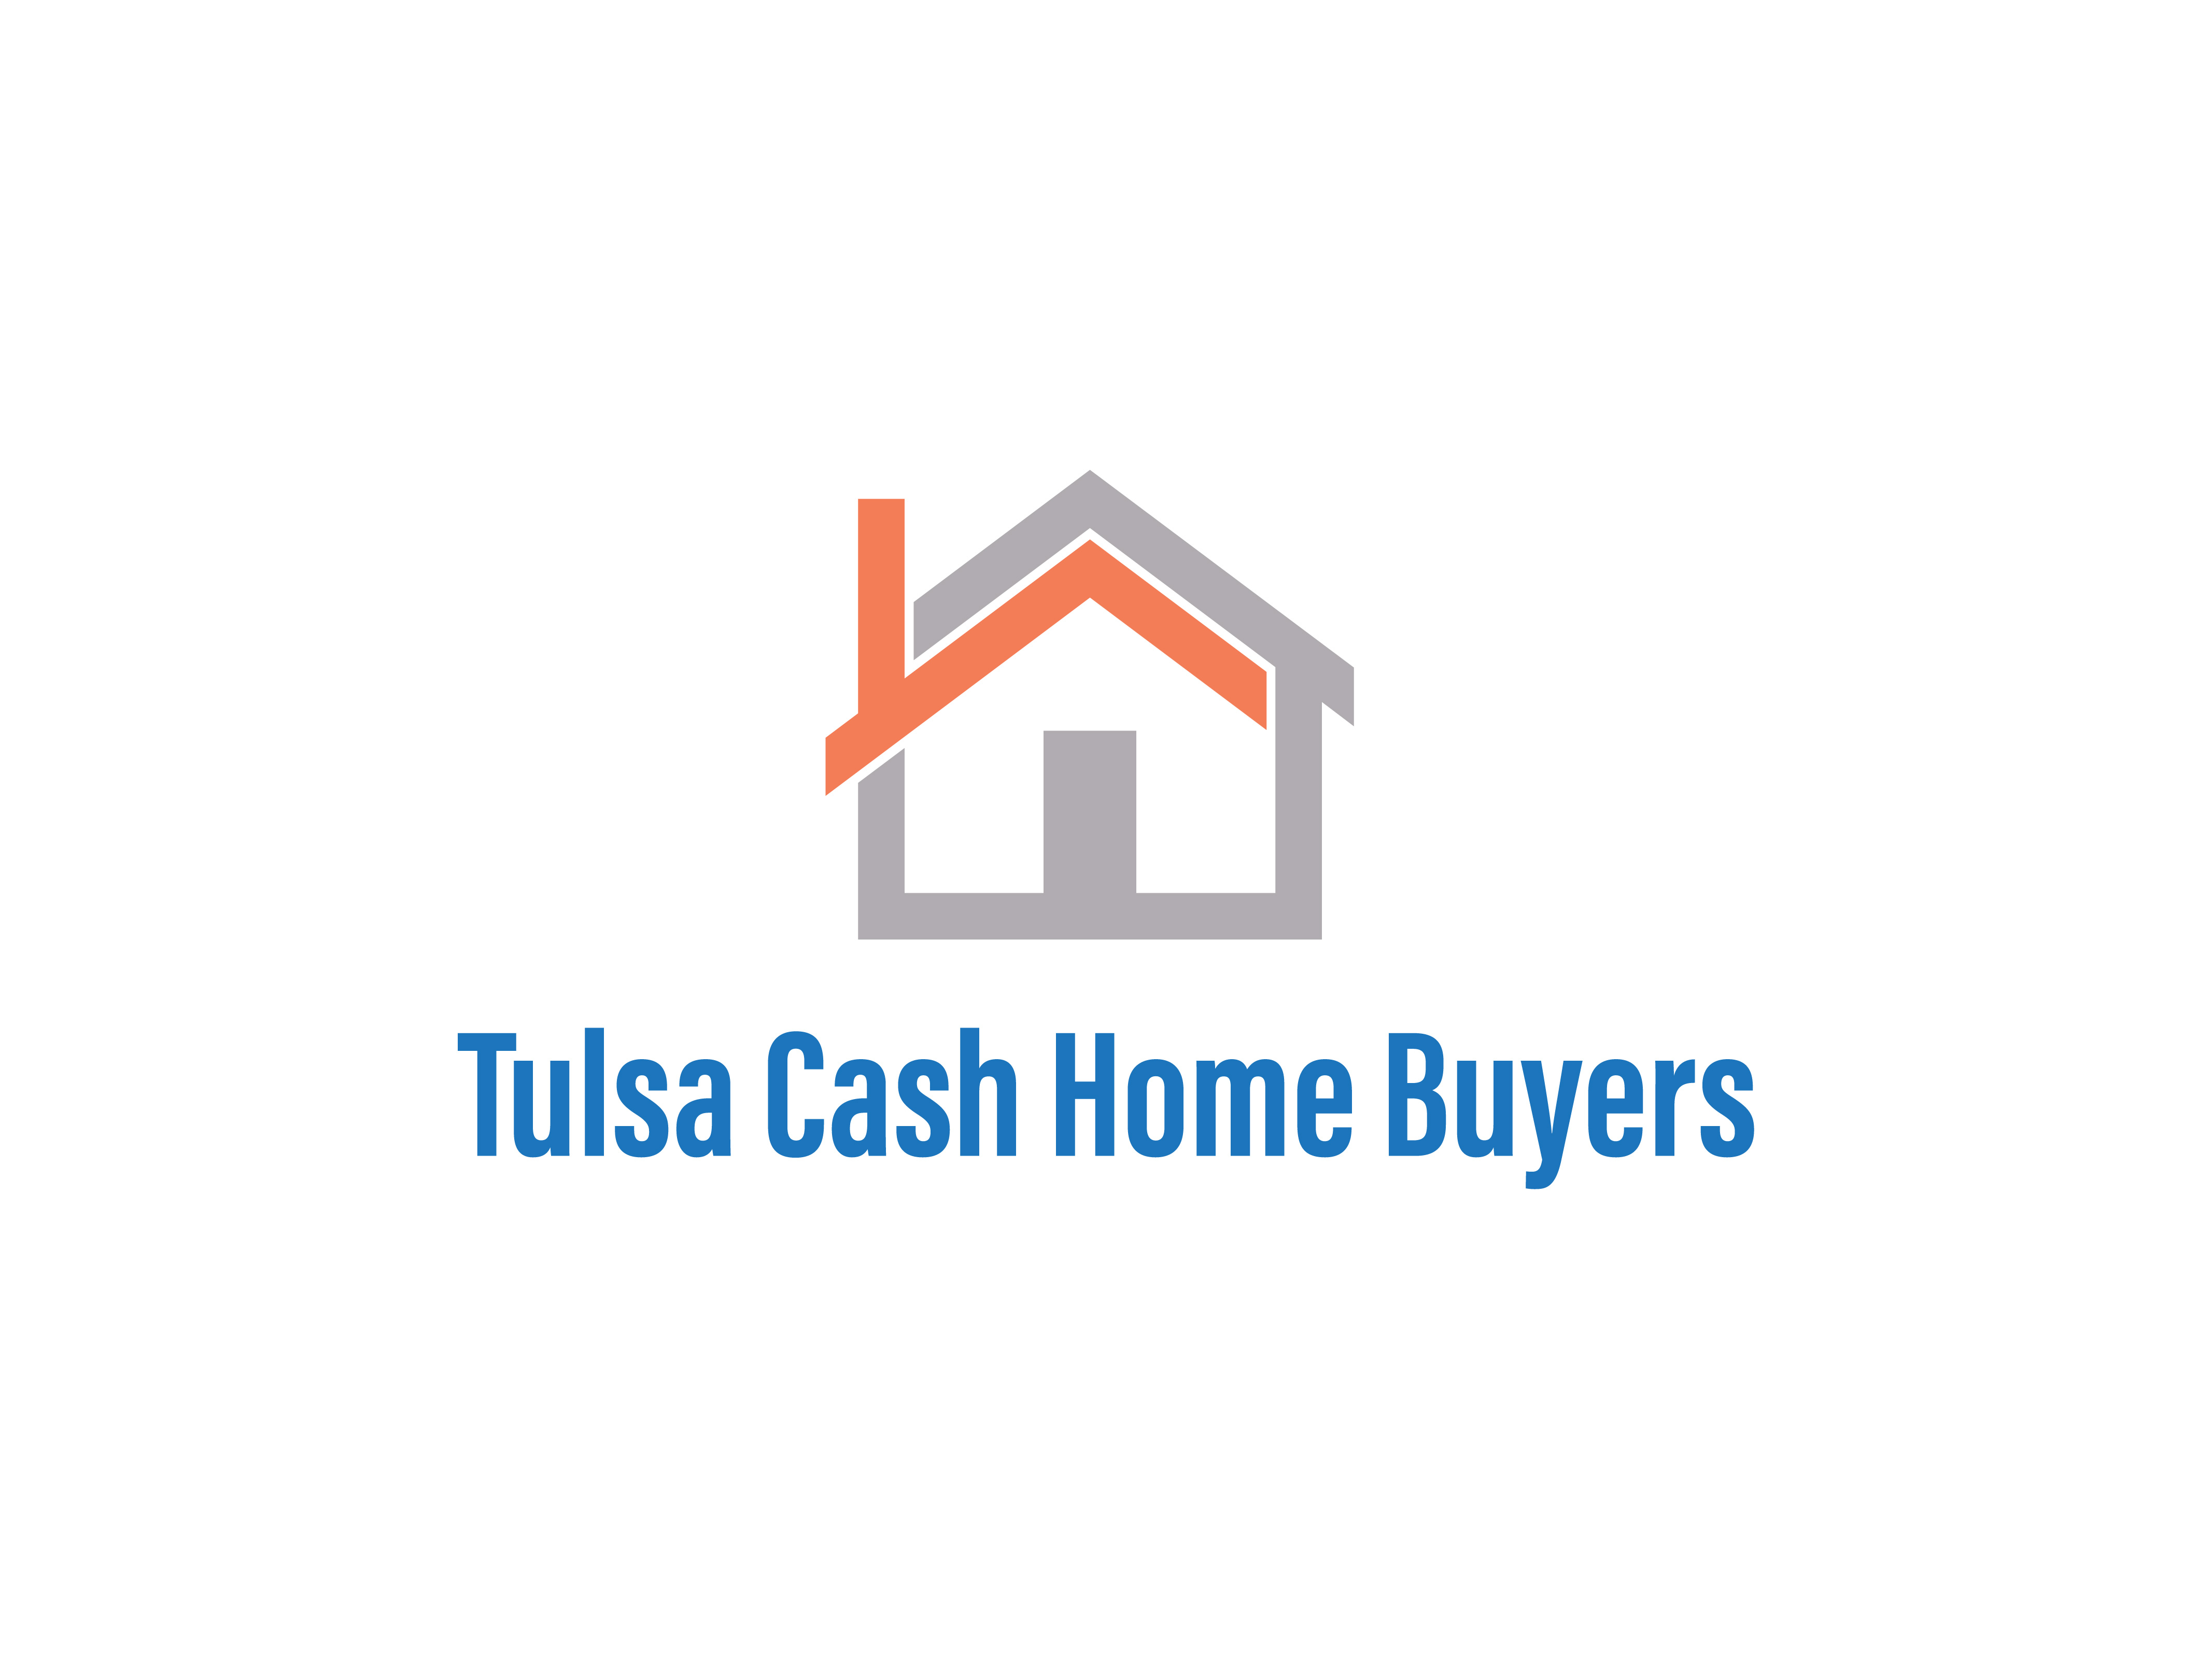 Tulsa Cash Home Buyers